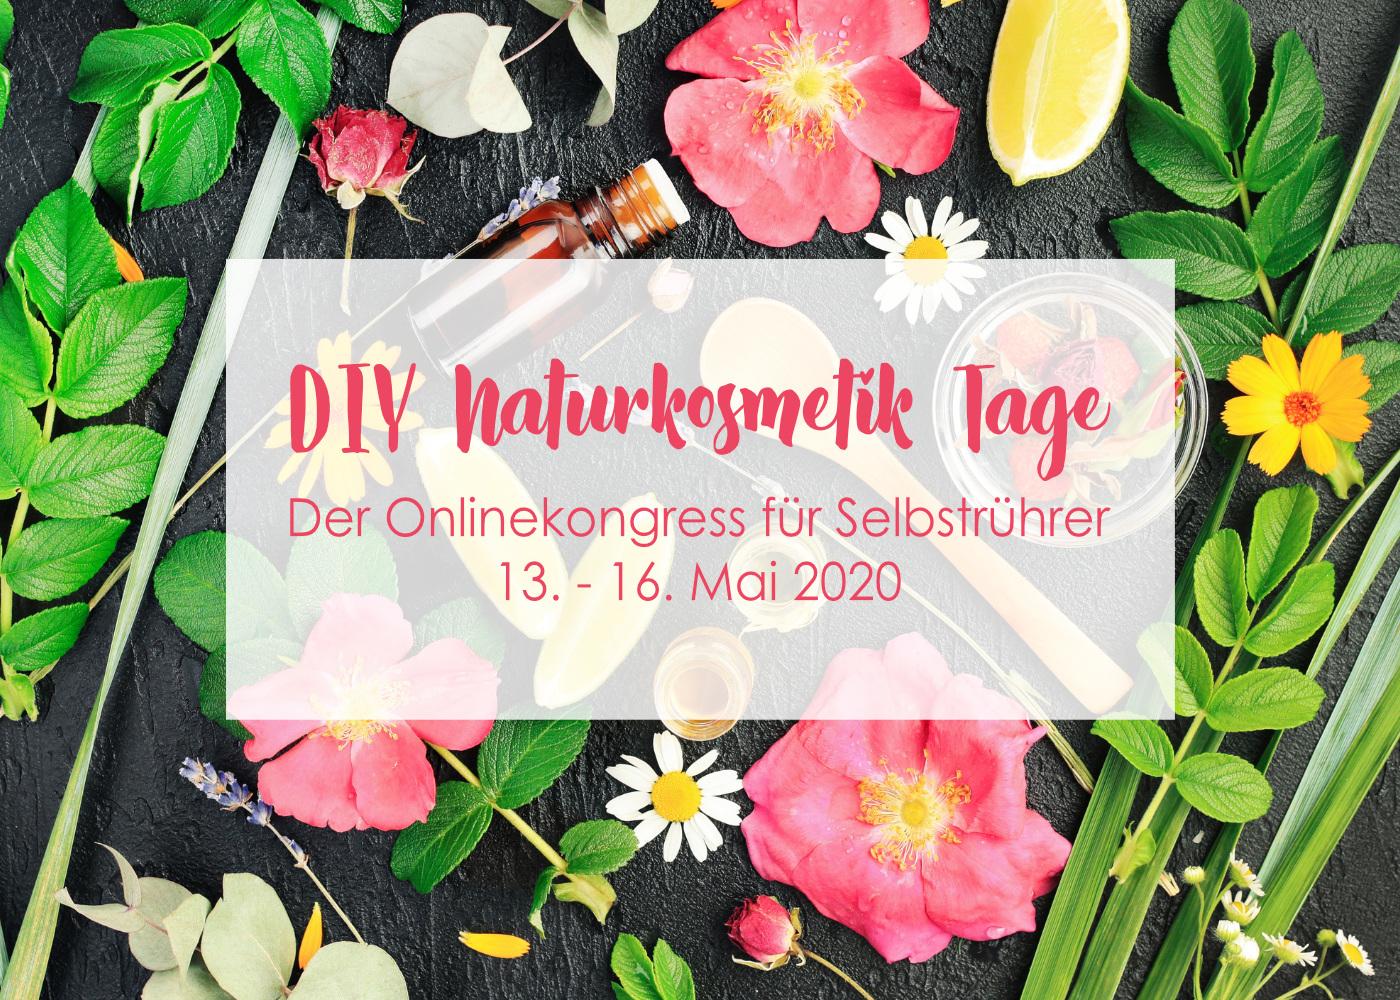 DIY Naturkosmetik Tage